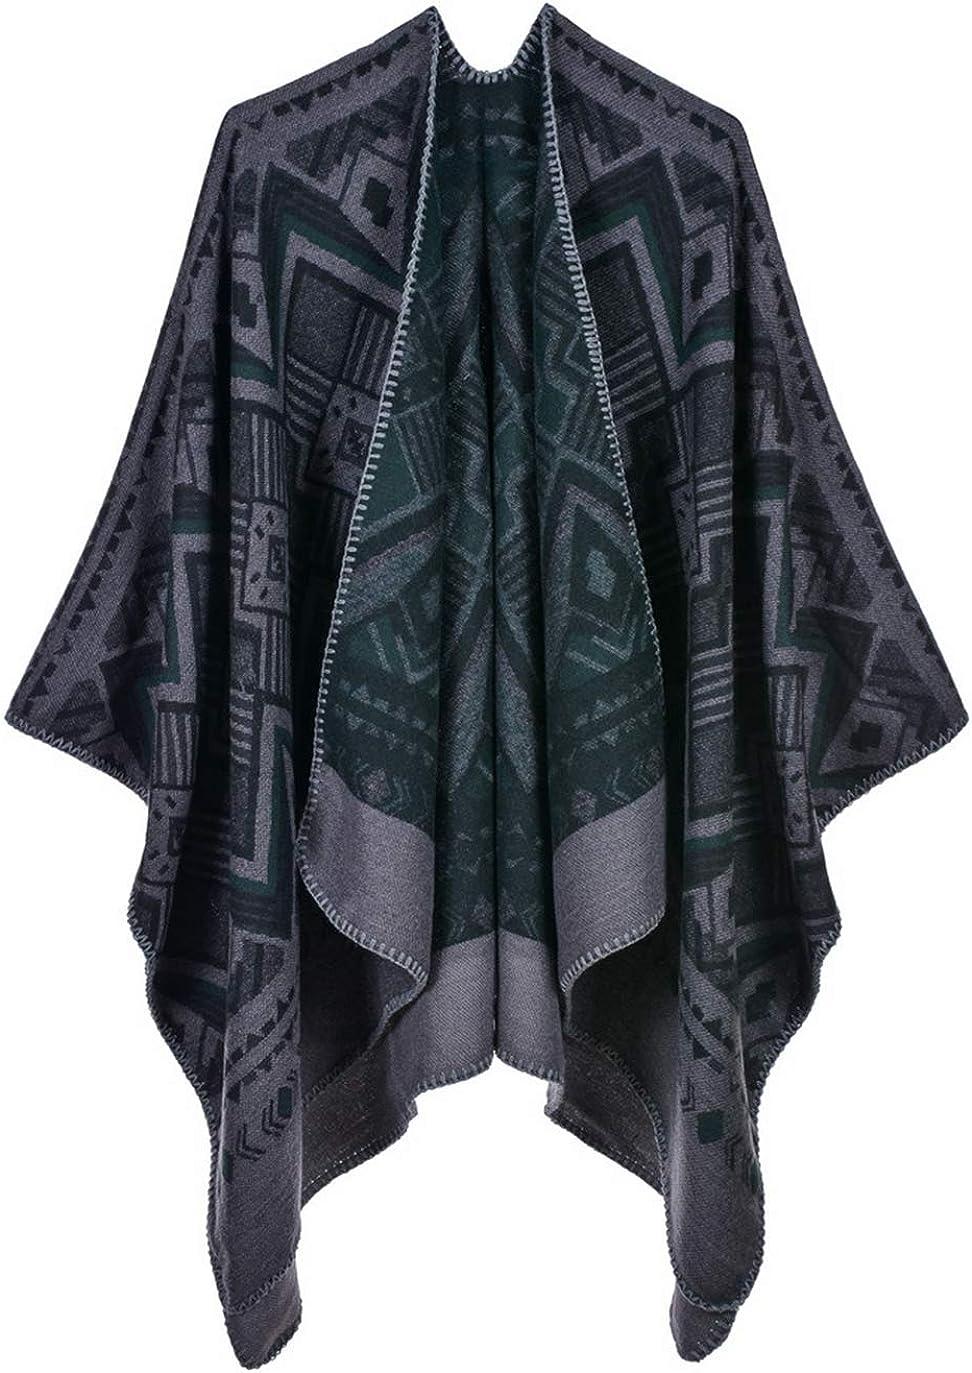 Idea Houses Women's Shawl Wrap Scarf Geometric Rhombus Lattice Thick Warm Poncho Cloak